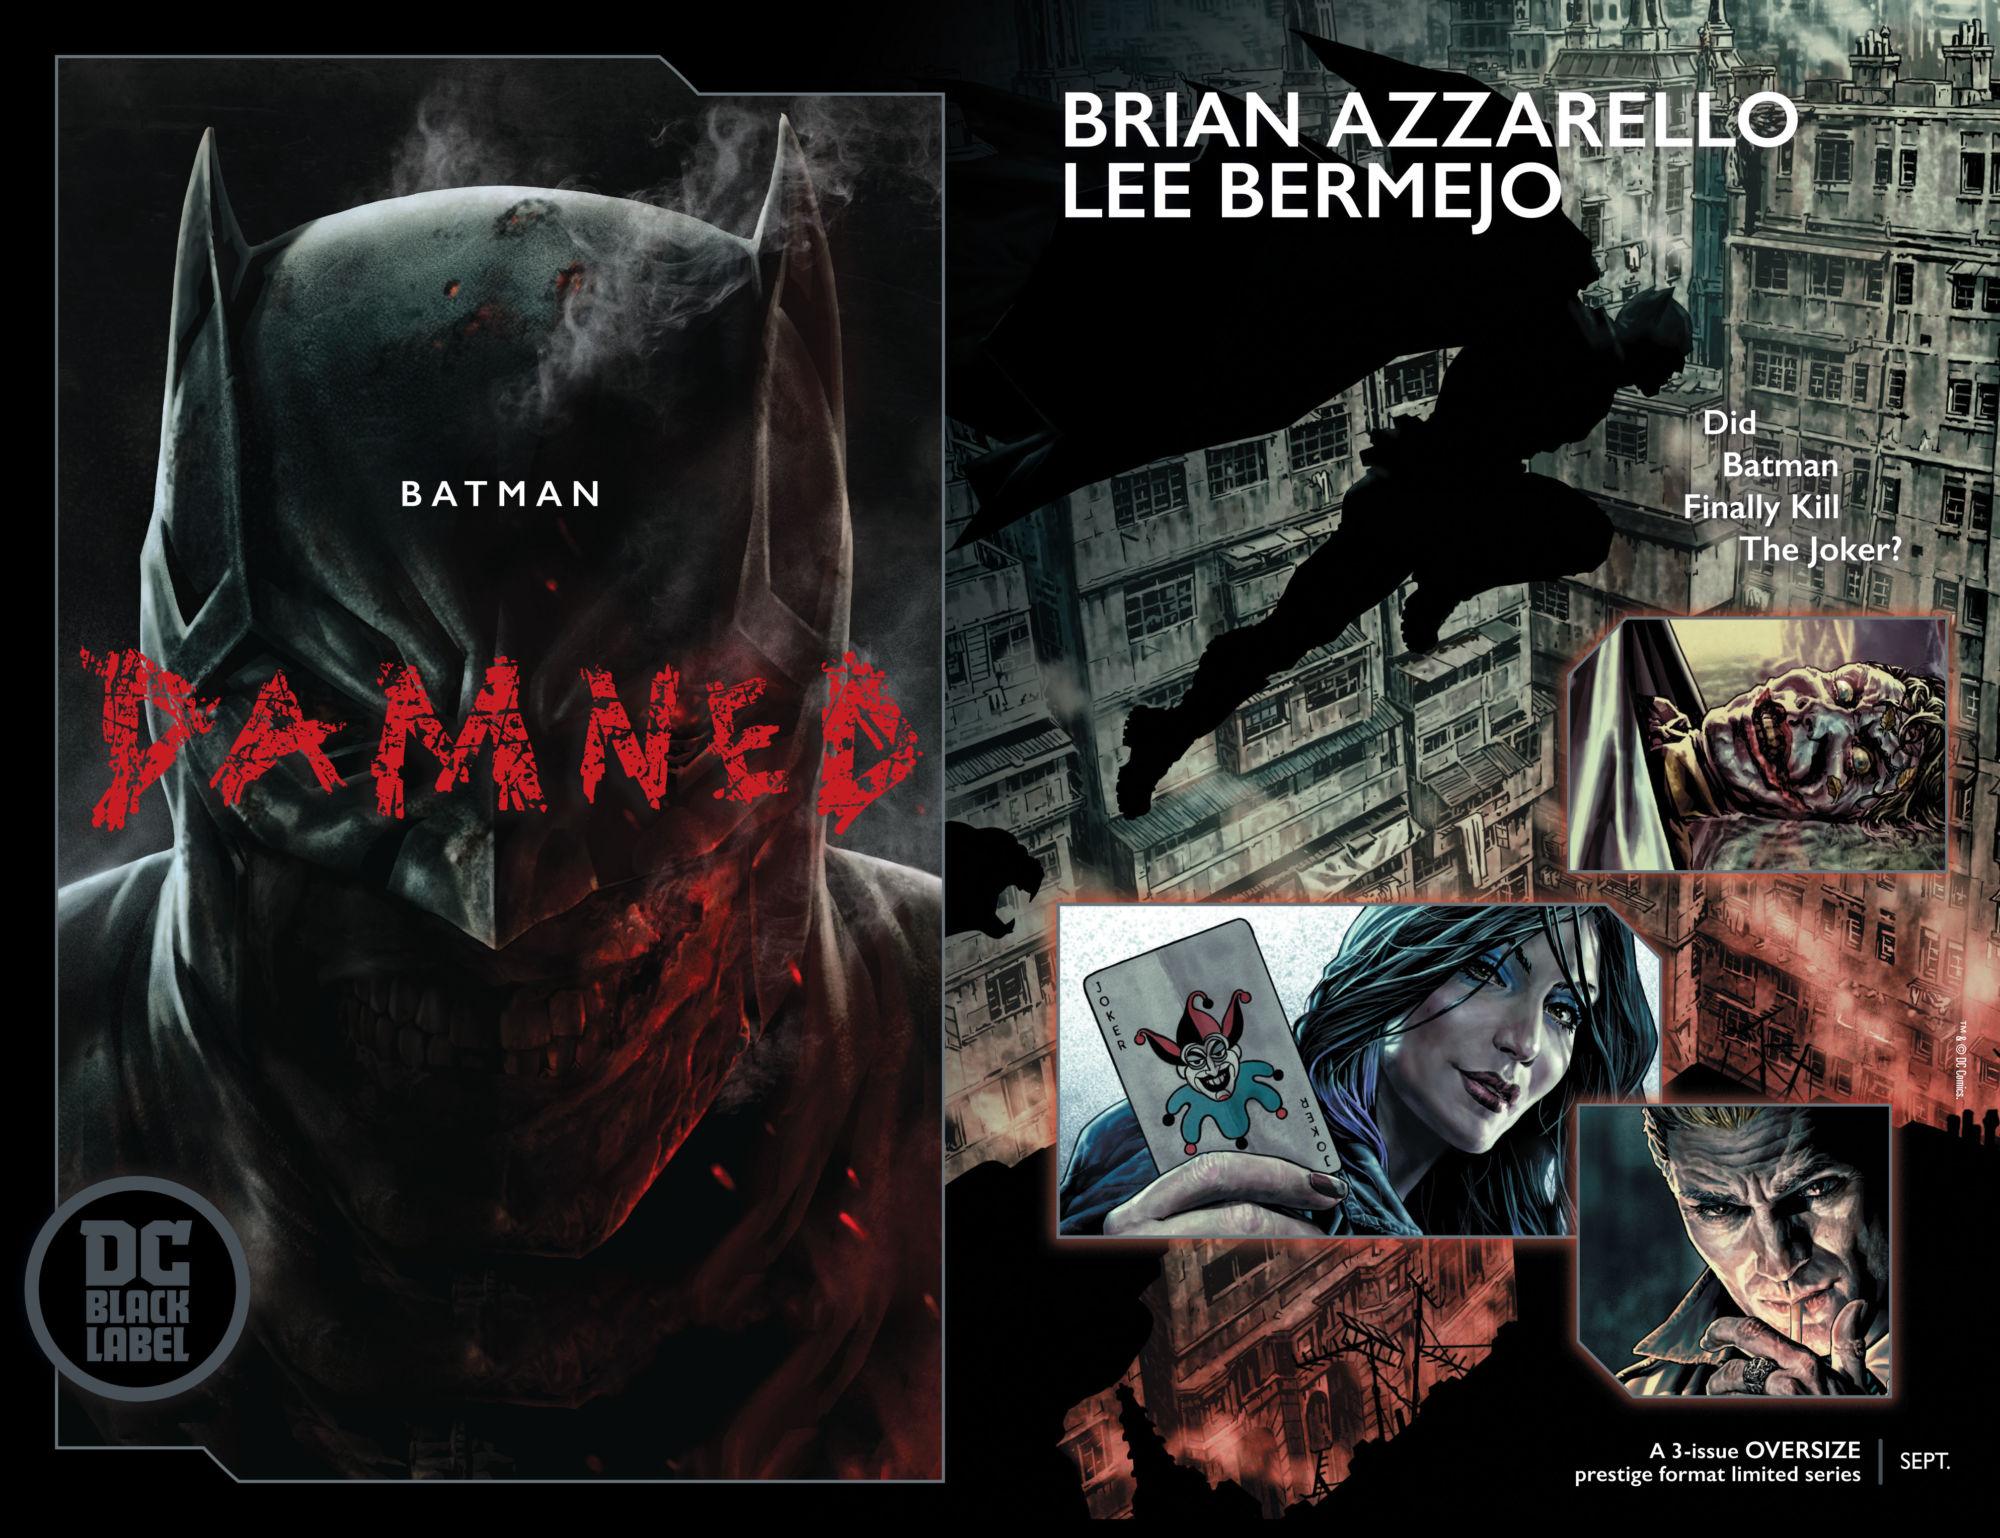 DC Comics kuasai bisnis komik superheroes sepanjang tahun 2018